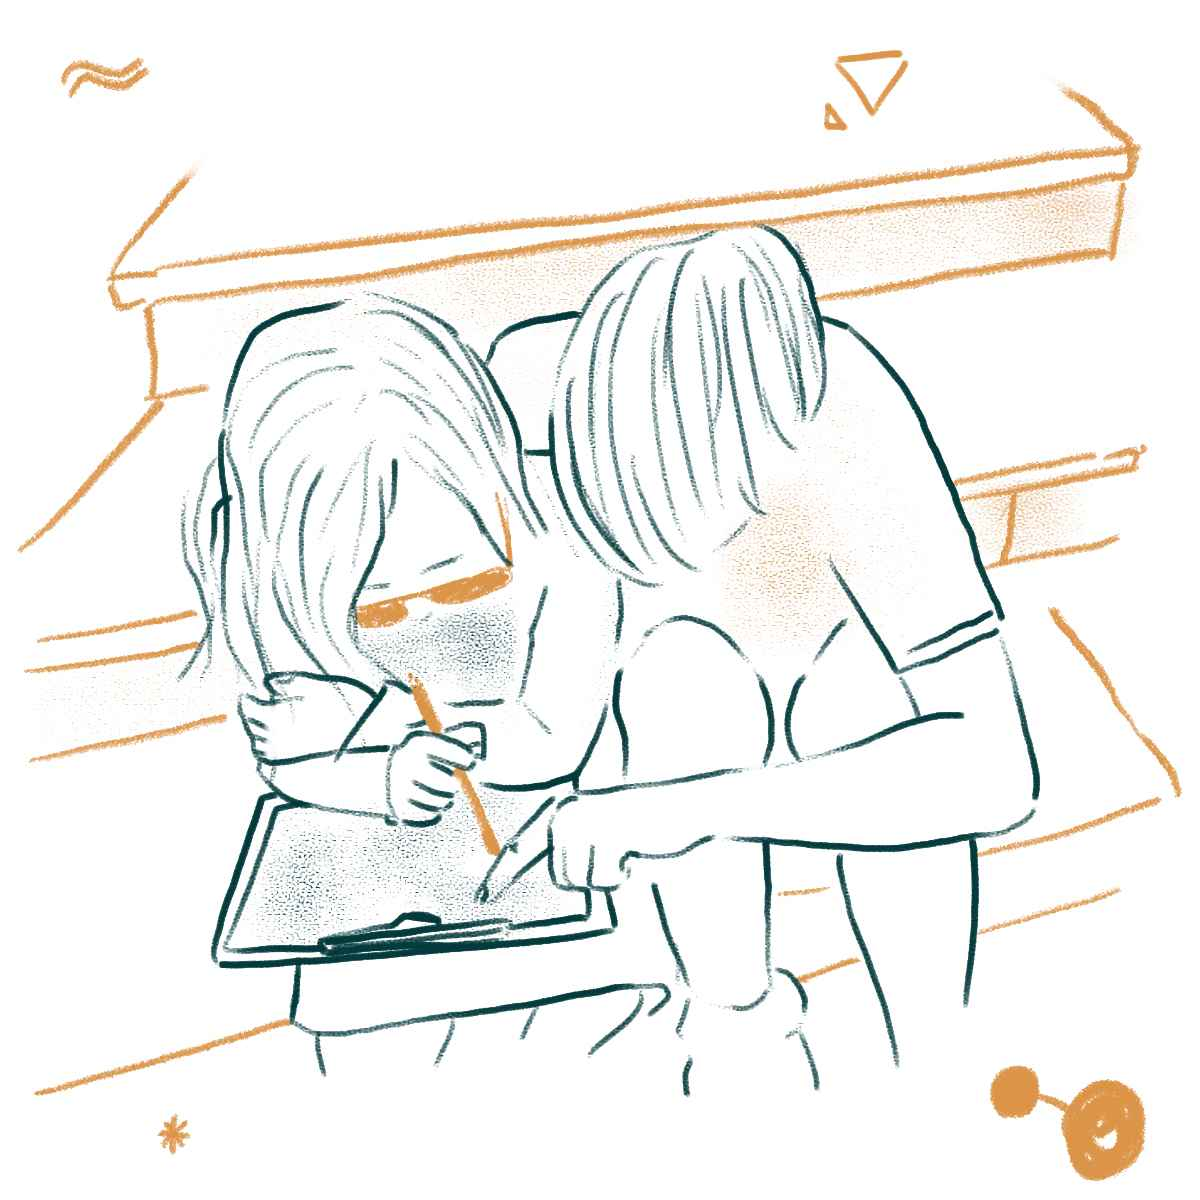 edusiia-illustration-junge-maedchen